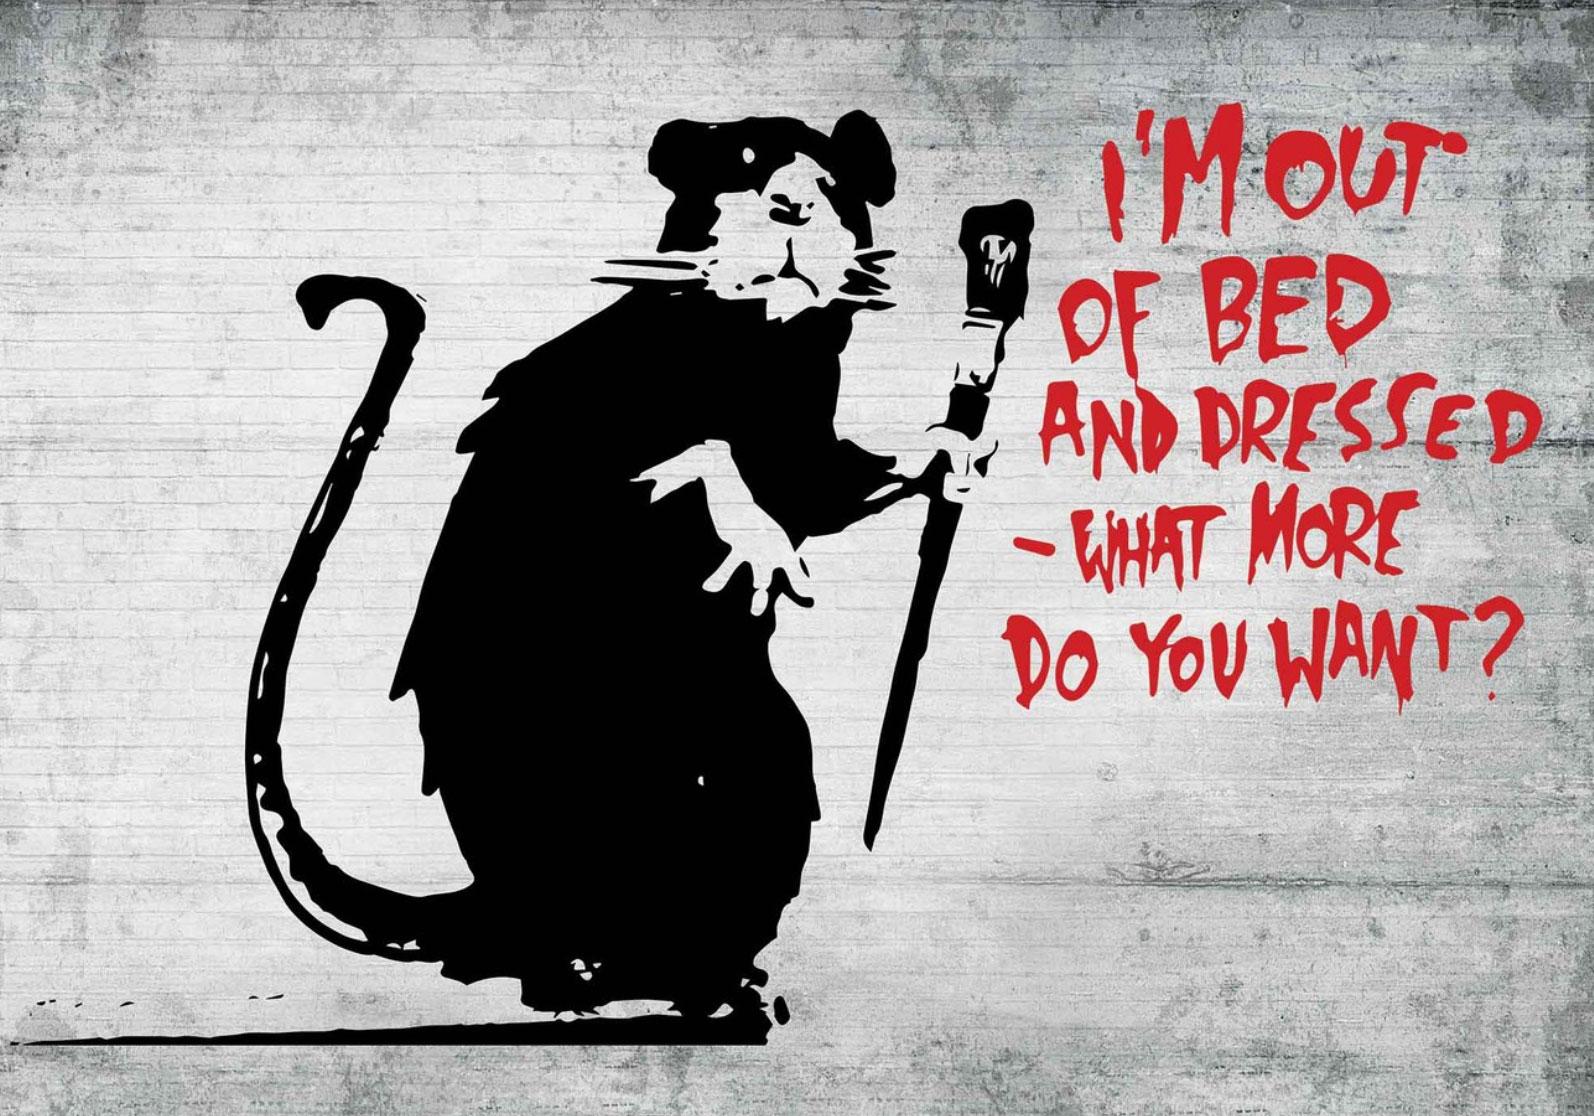 Banksy ( バンクシー ) |展示プロセスやギャラリーをも作品の一部とするストリートアート最大の人気アーティスト